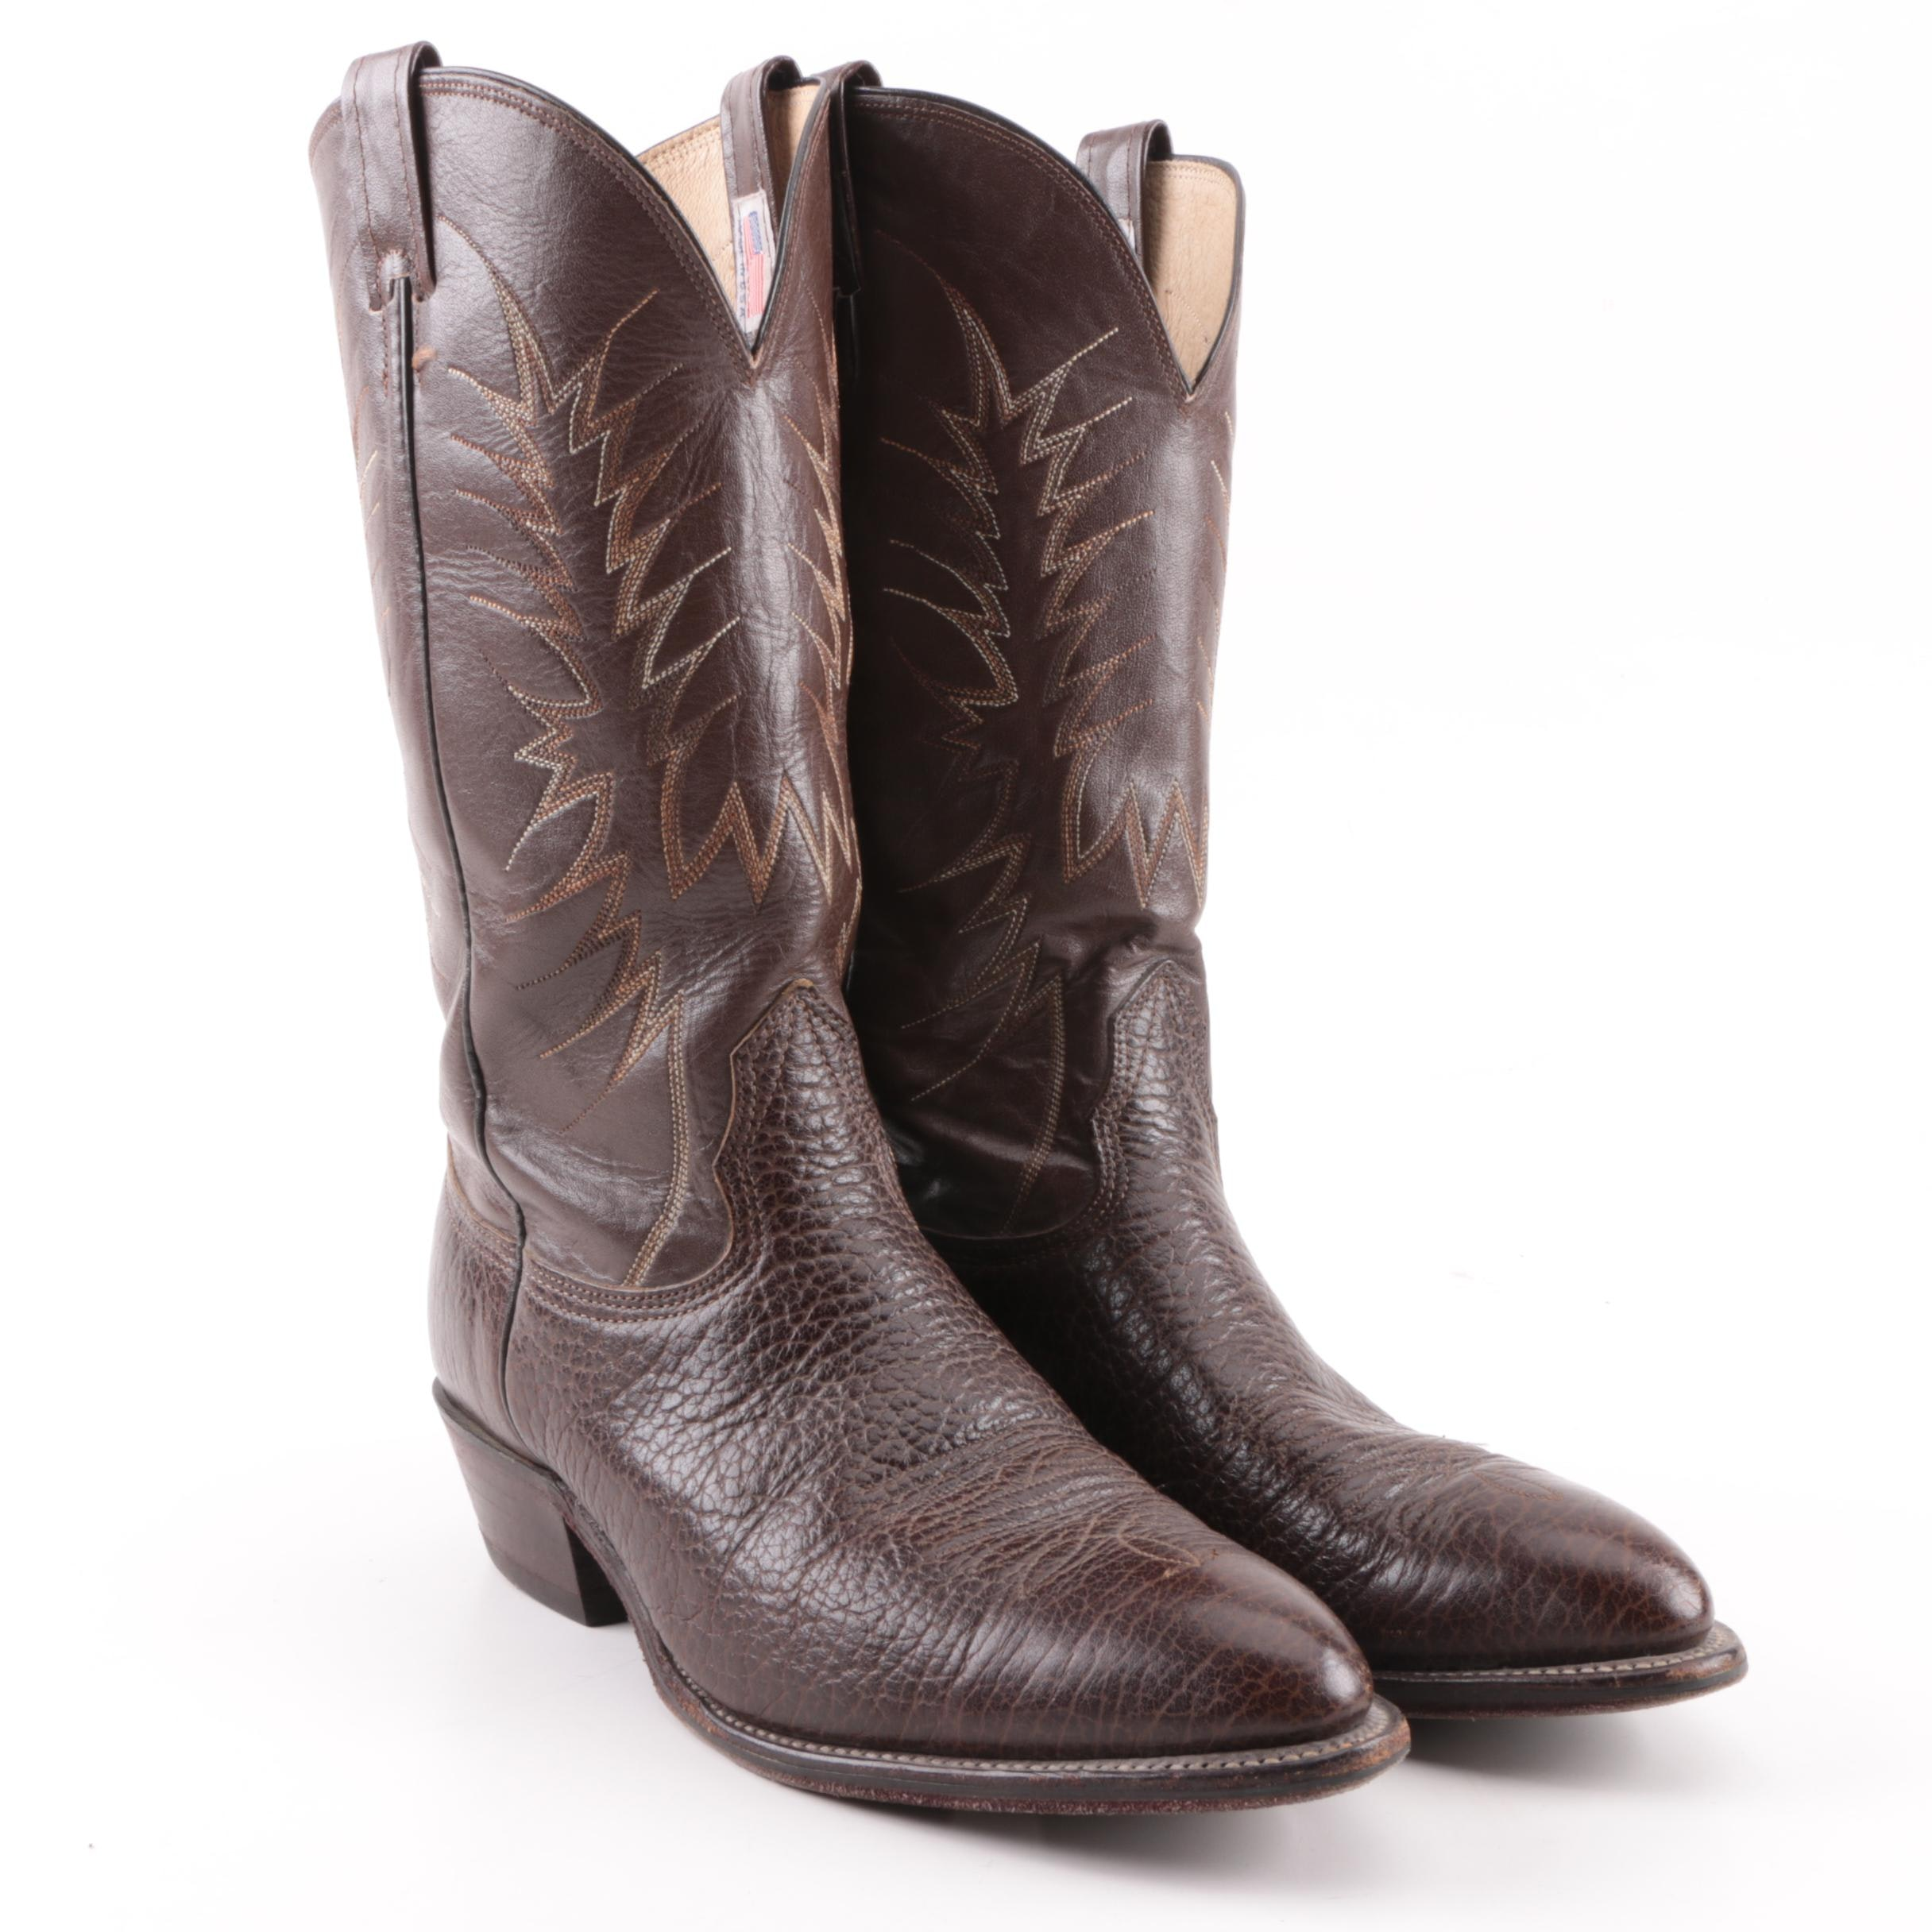 Men's Vintage Nocona Brown Leather Cowboy Boots